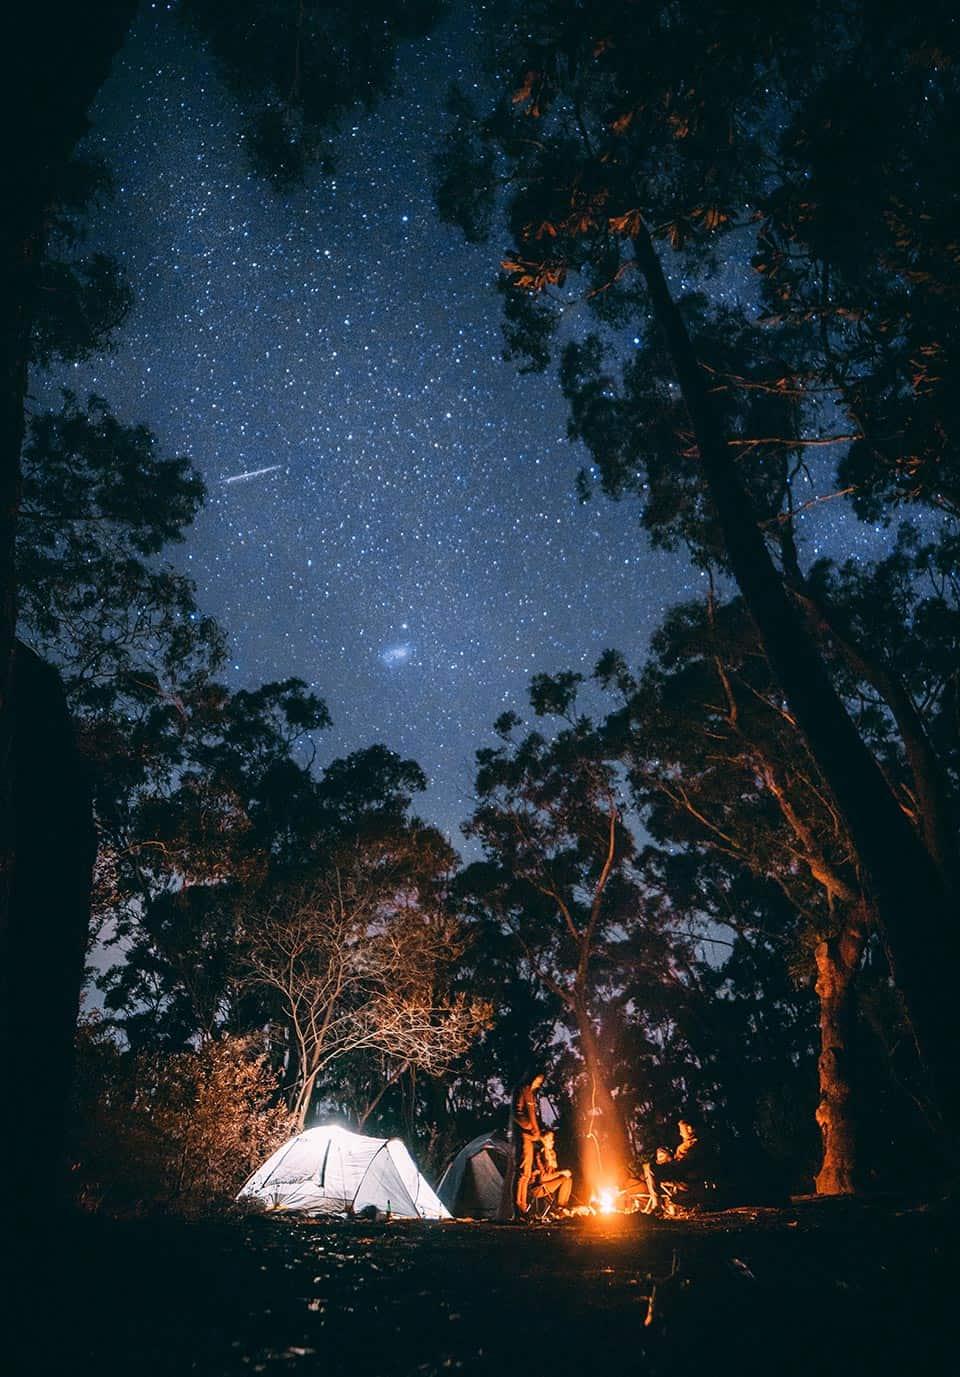 adult campfire activities